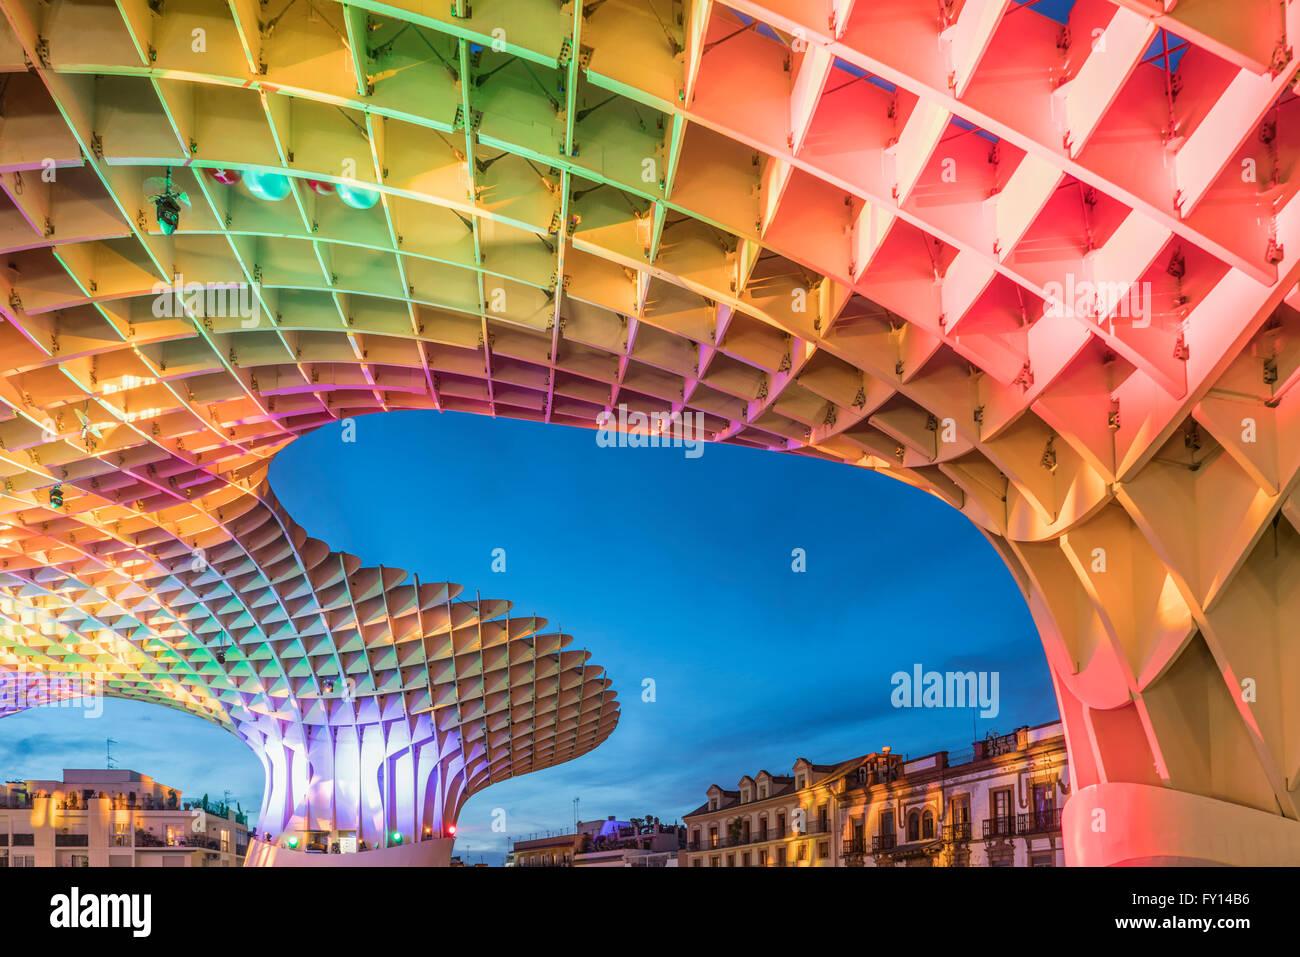 Metropol Parasol , Plaza de la Encarnacion ,Seville, J. Mayer Hermann architects, bonded timber with polyurethane - Stock Image